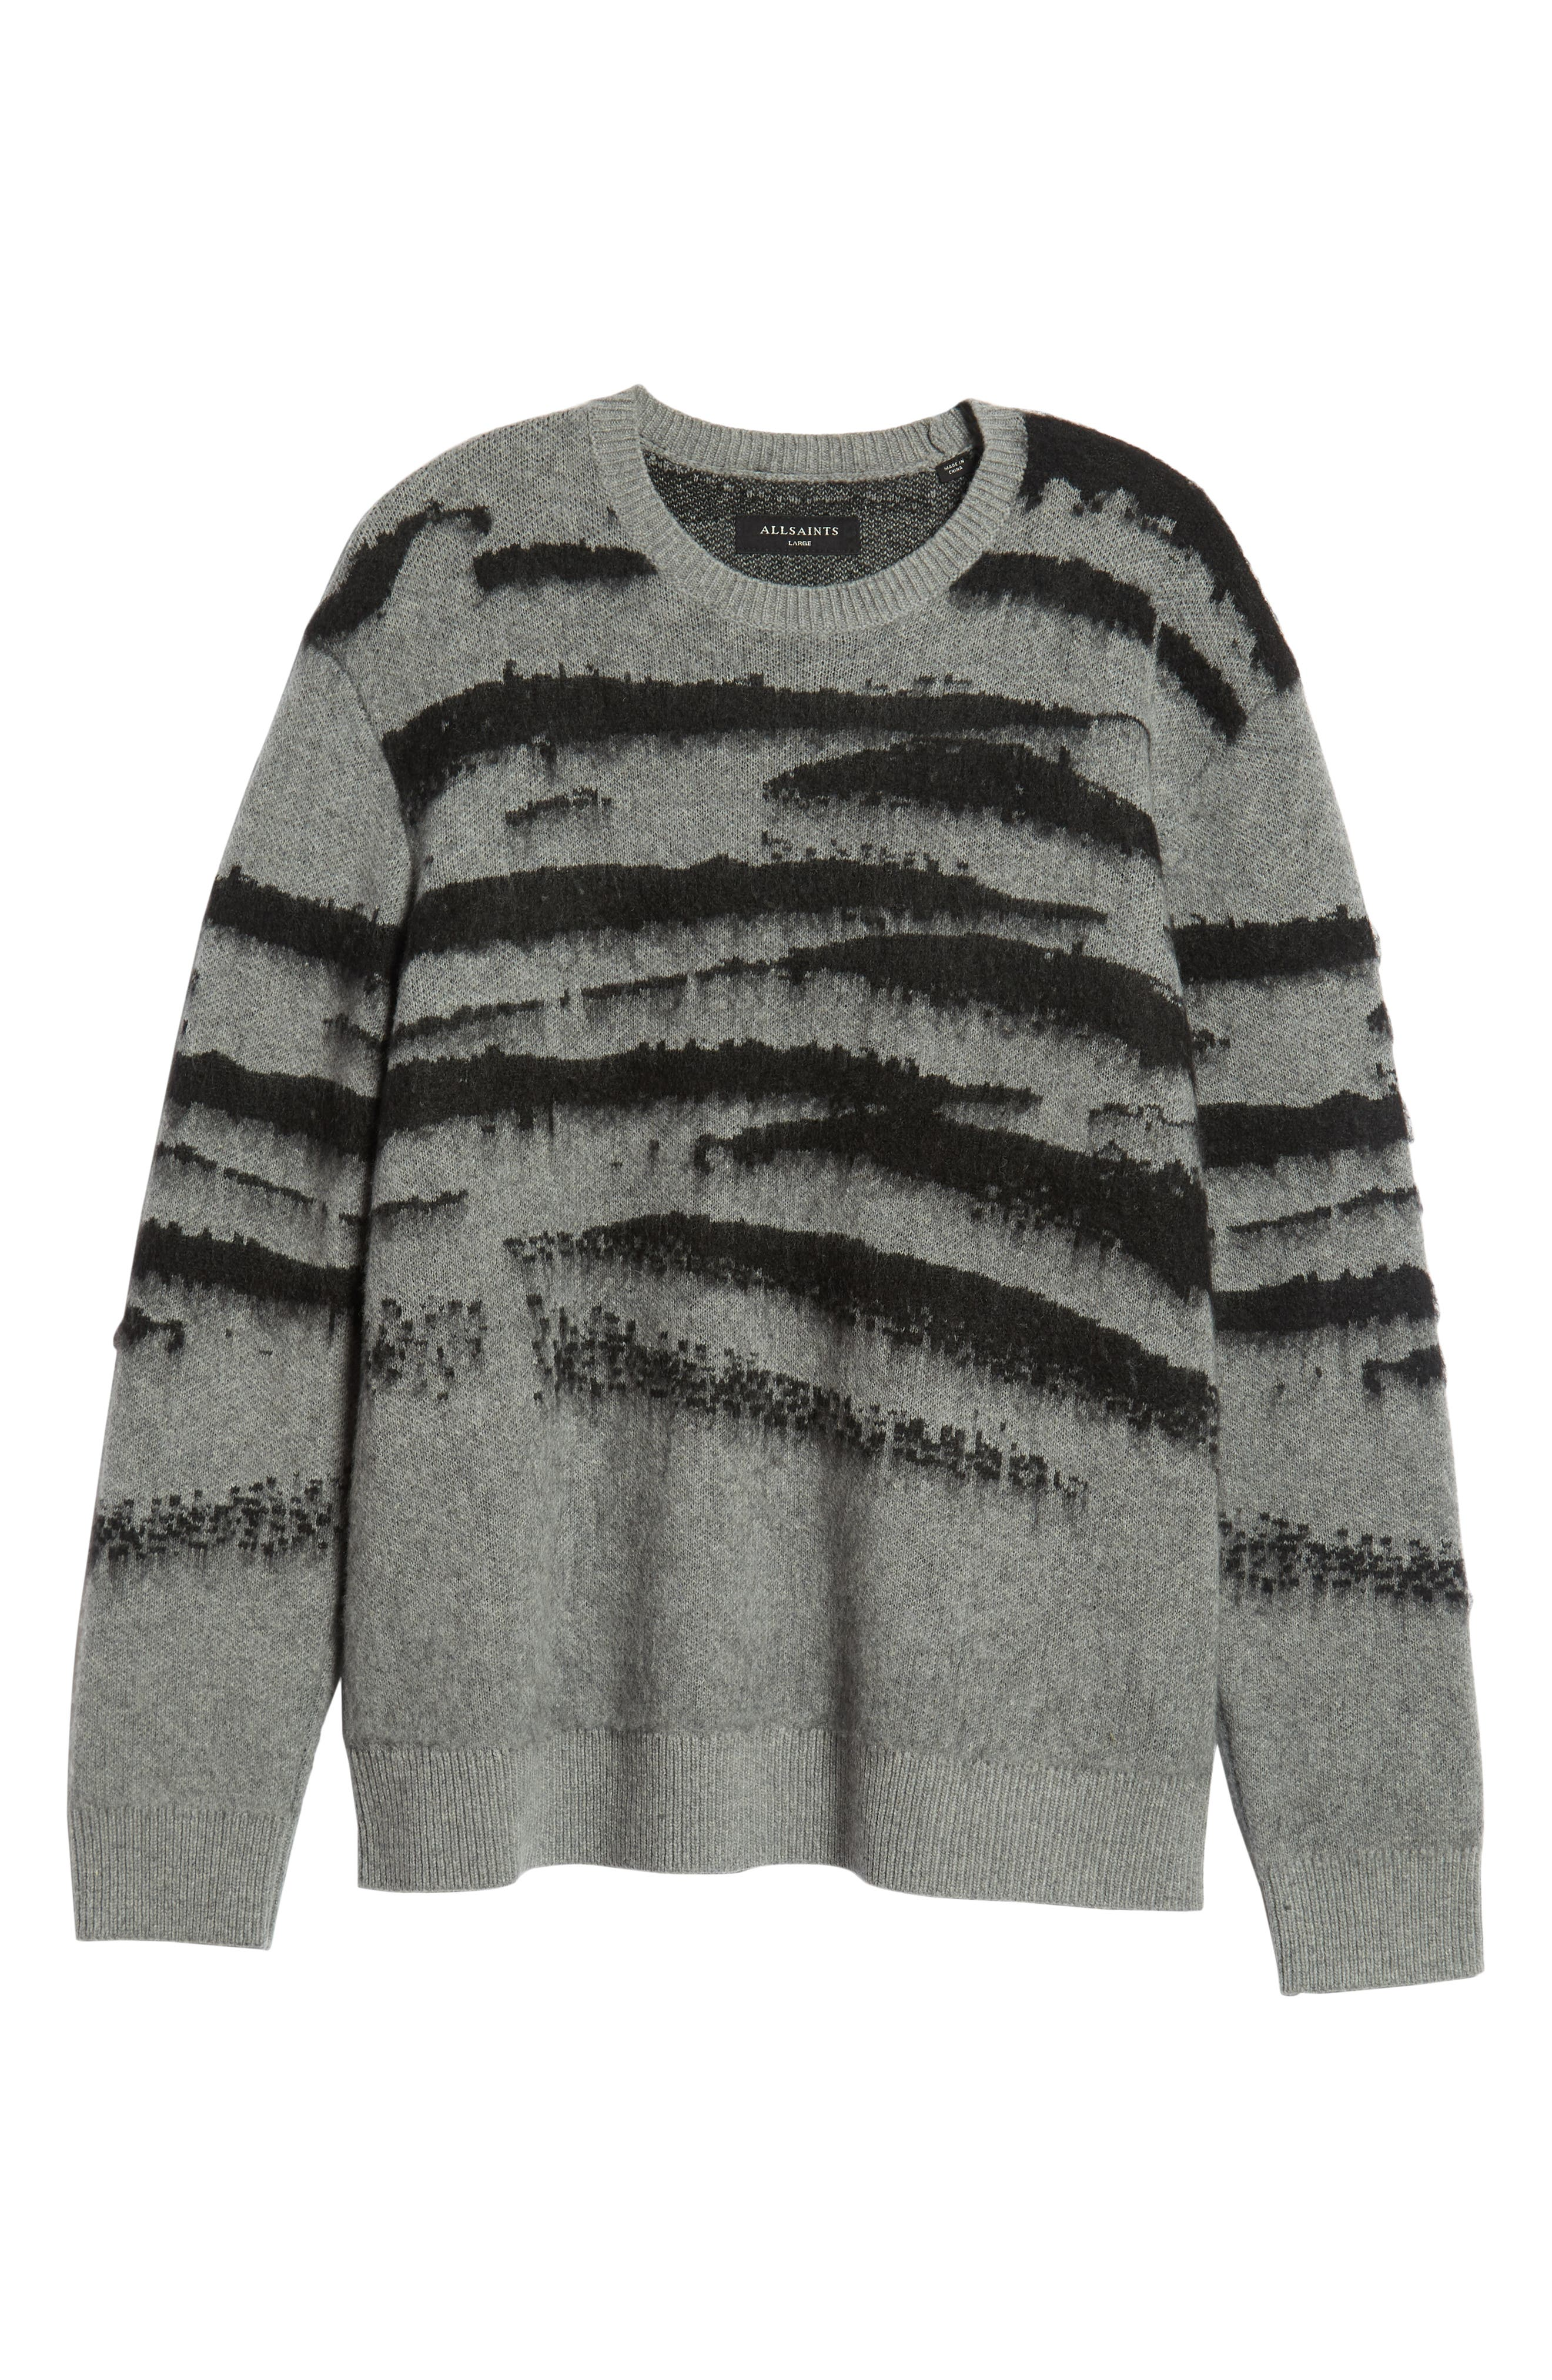 Ture Regular Fit Sweater,                             Alternate thumbnail 6, color,                             GREY/ CINDER